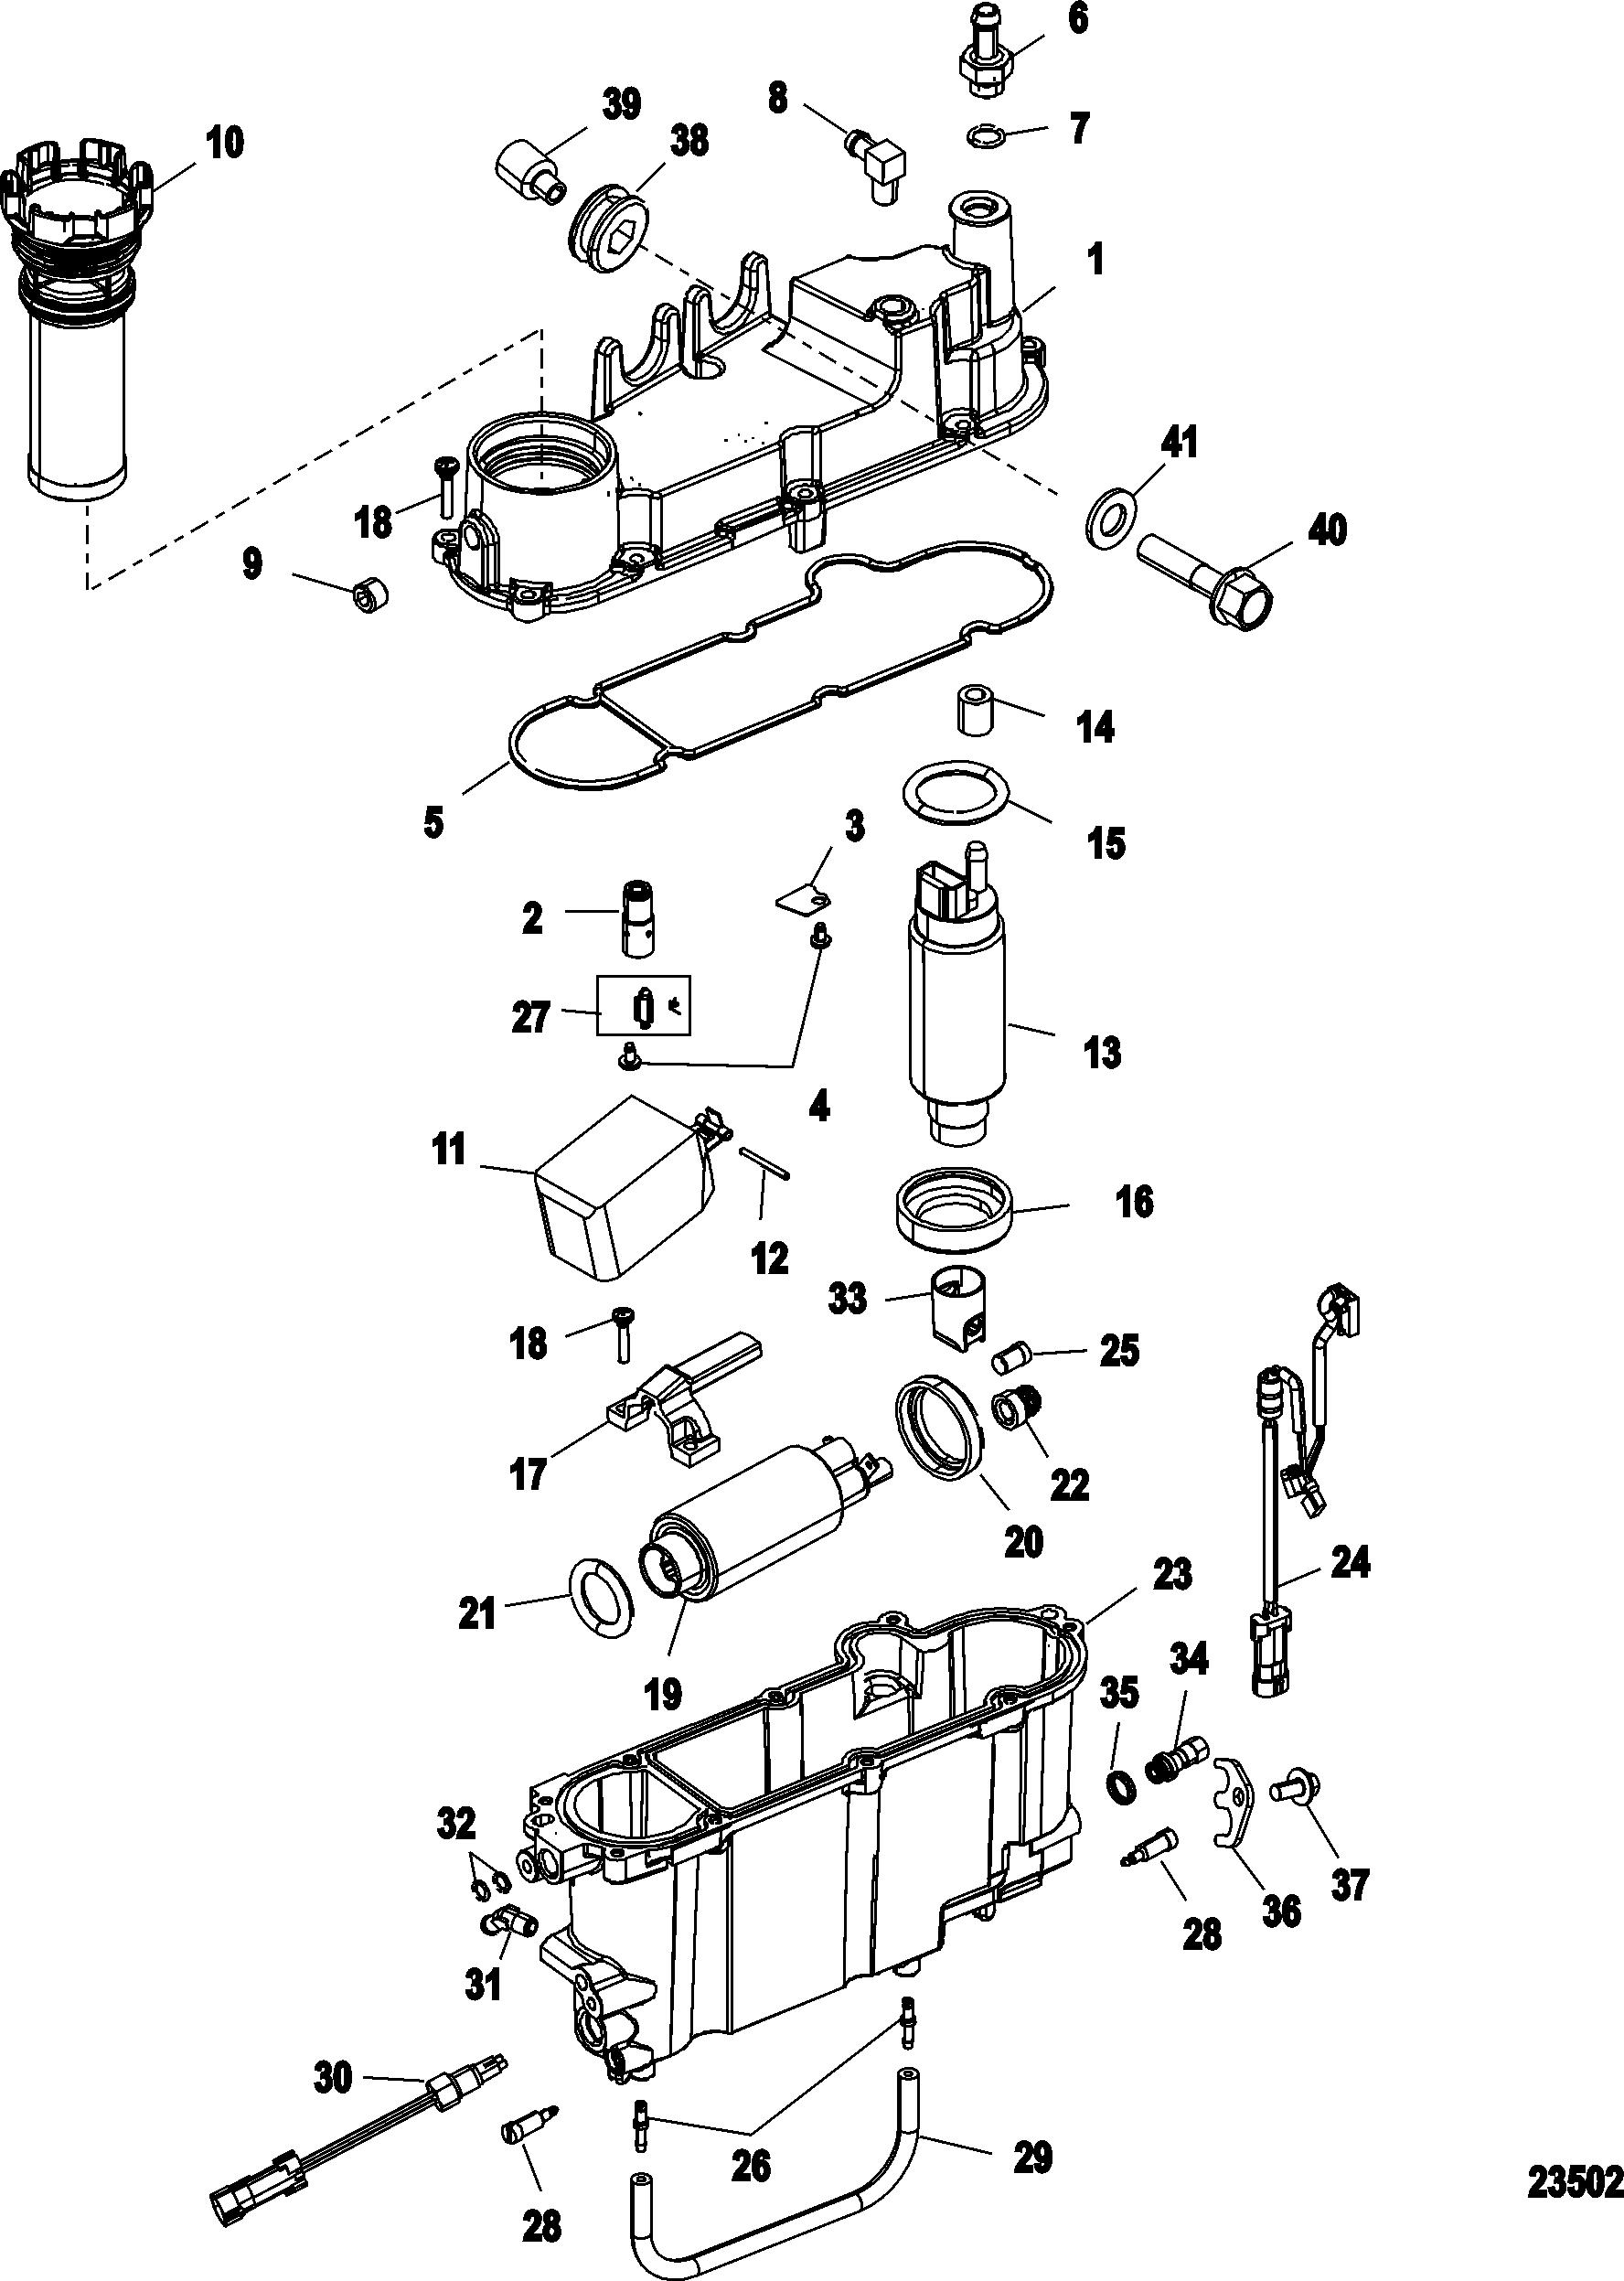 hight resolution of mercury fuel pump diagram data diagram schematicmercury fuel pump diagram wiring diagram datasource mercury outboard fuel